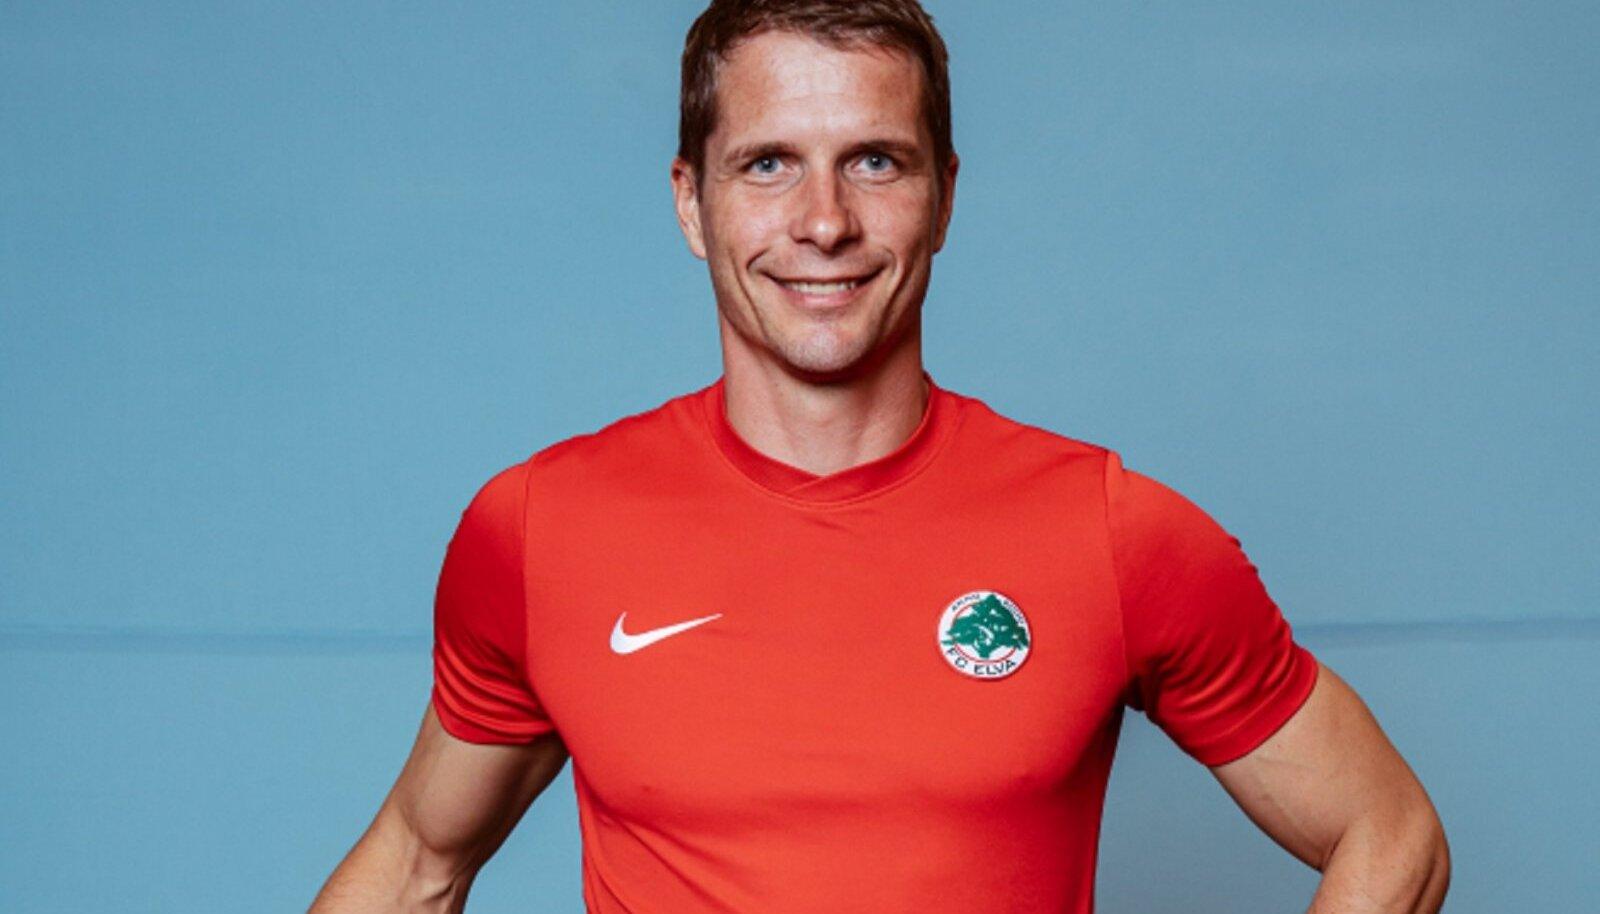 AMET LÄBI: Marek Naaris enam FC Elva ridadesse ei kuulu.